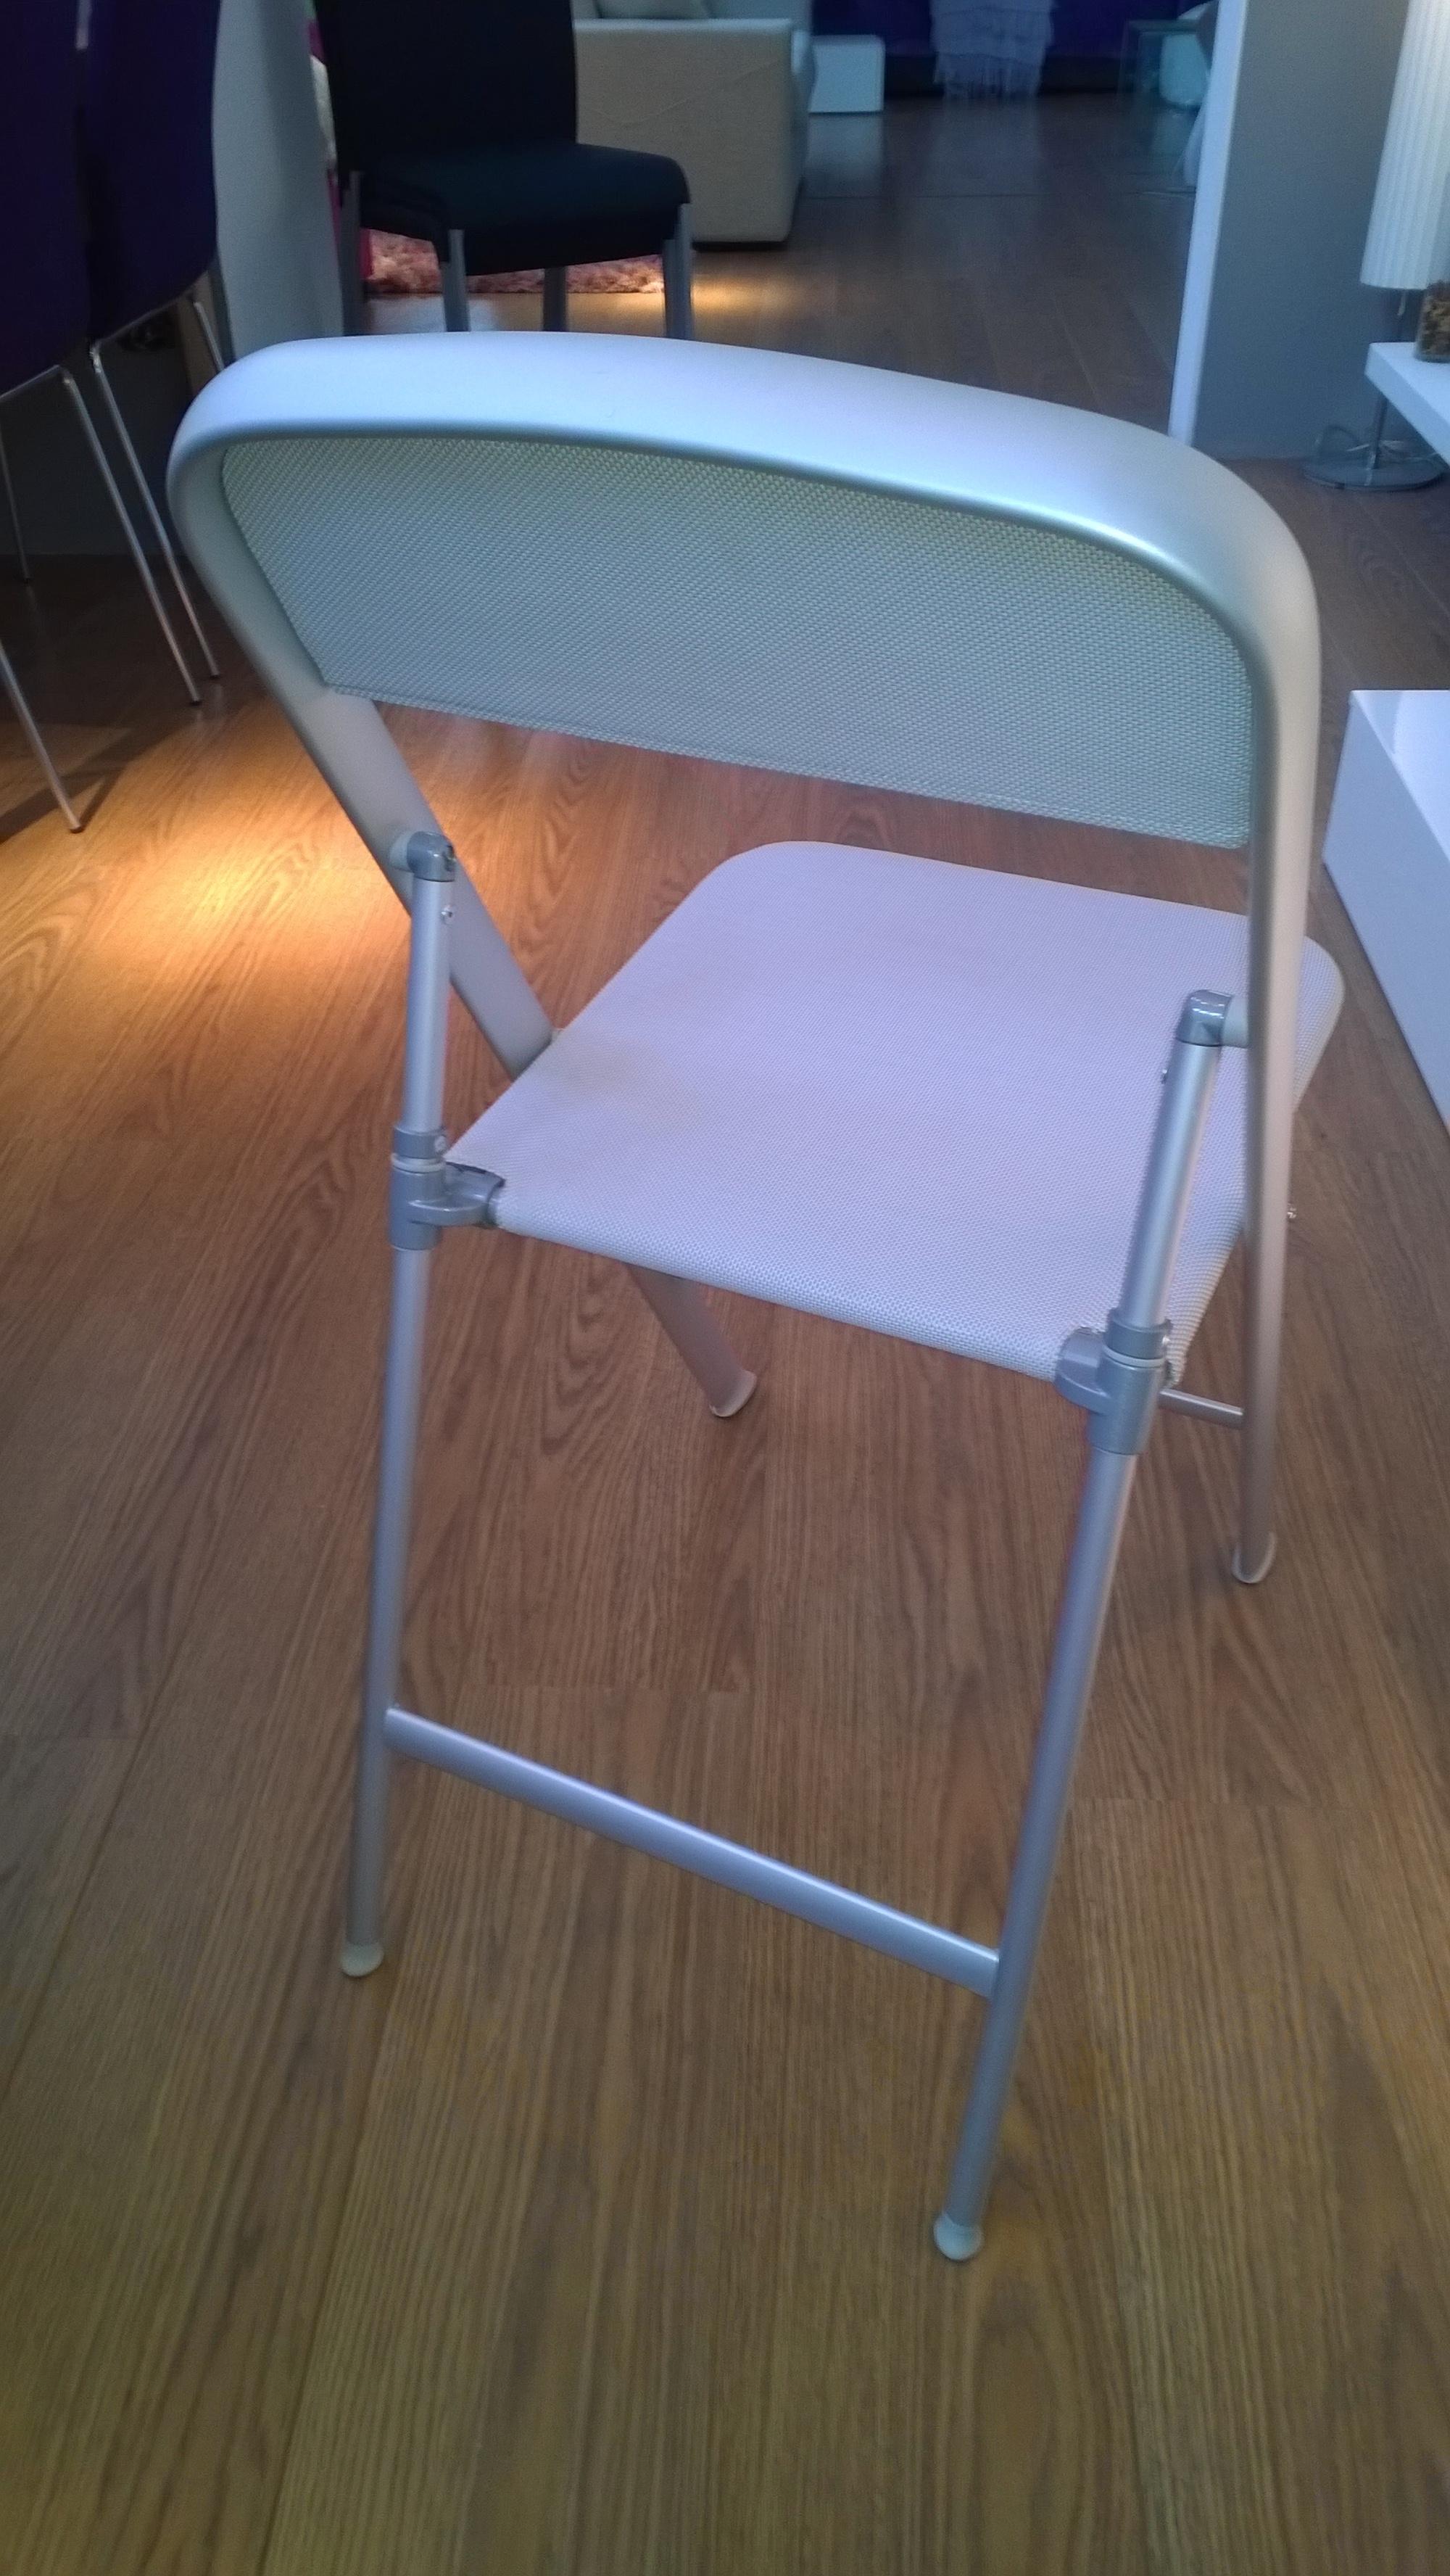 Sedia calligaris alu pieghevole sedie a prezzi scontati for Outlet sedie calligaris